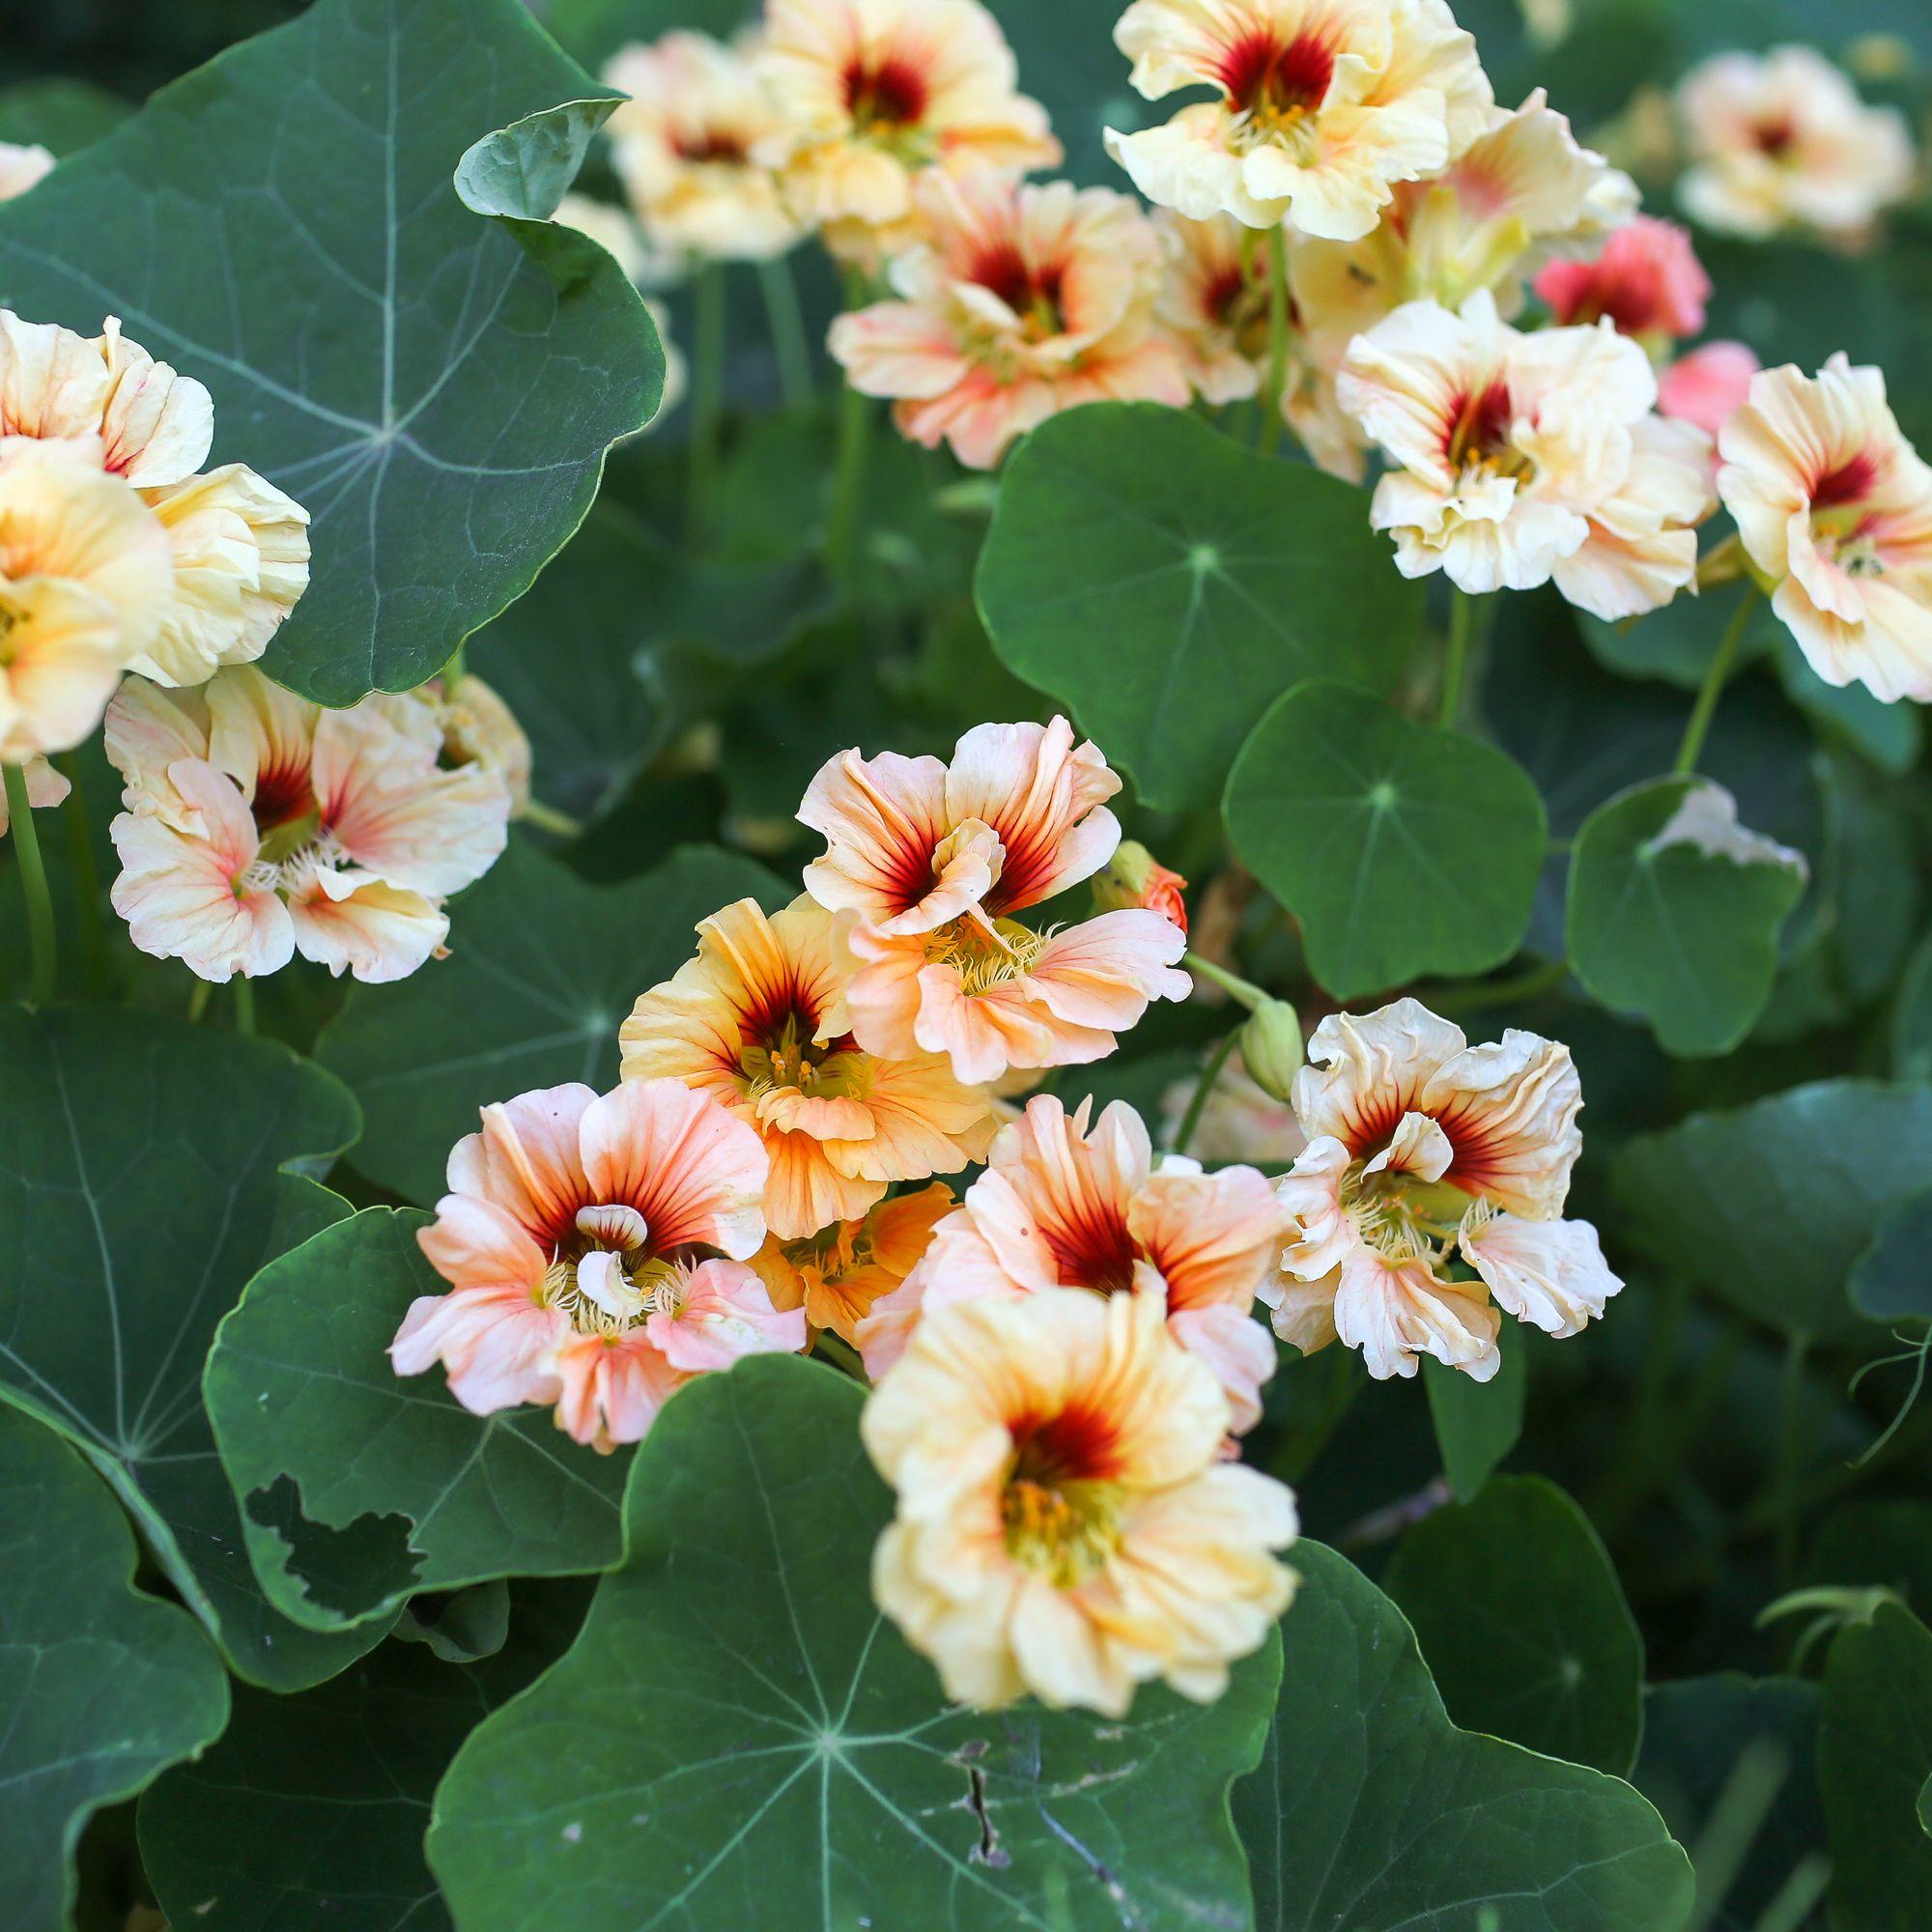 Buy culinary herbs plants nasturtium plants - Nasturtium Gleam Salmon Floret Flowers